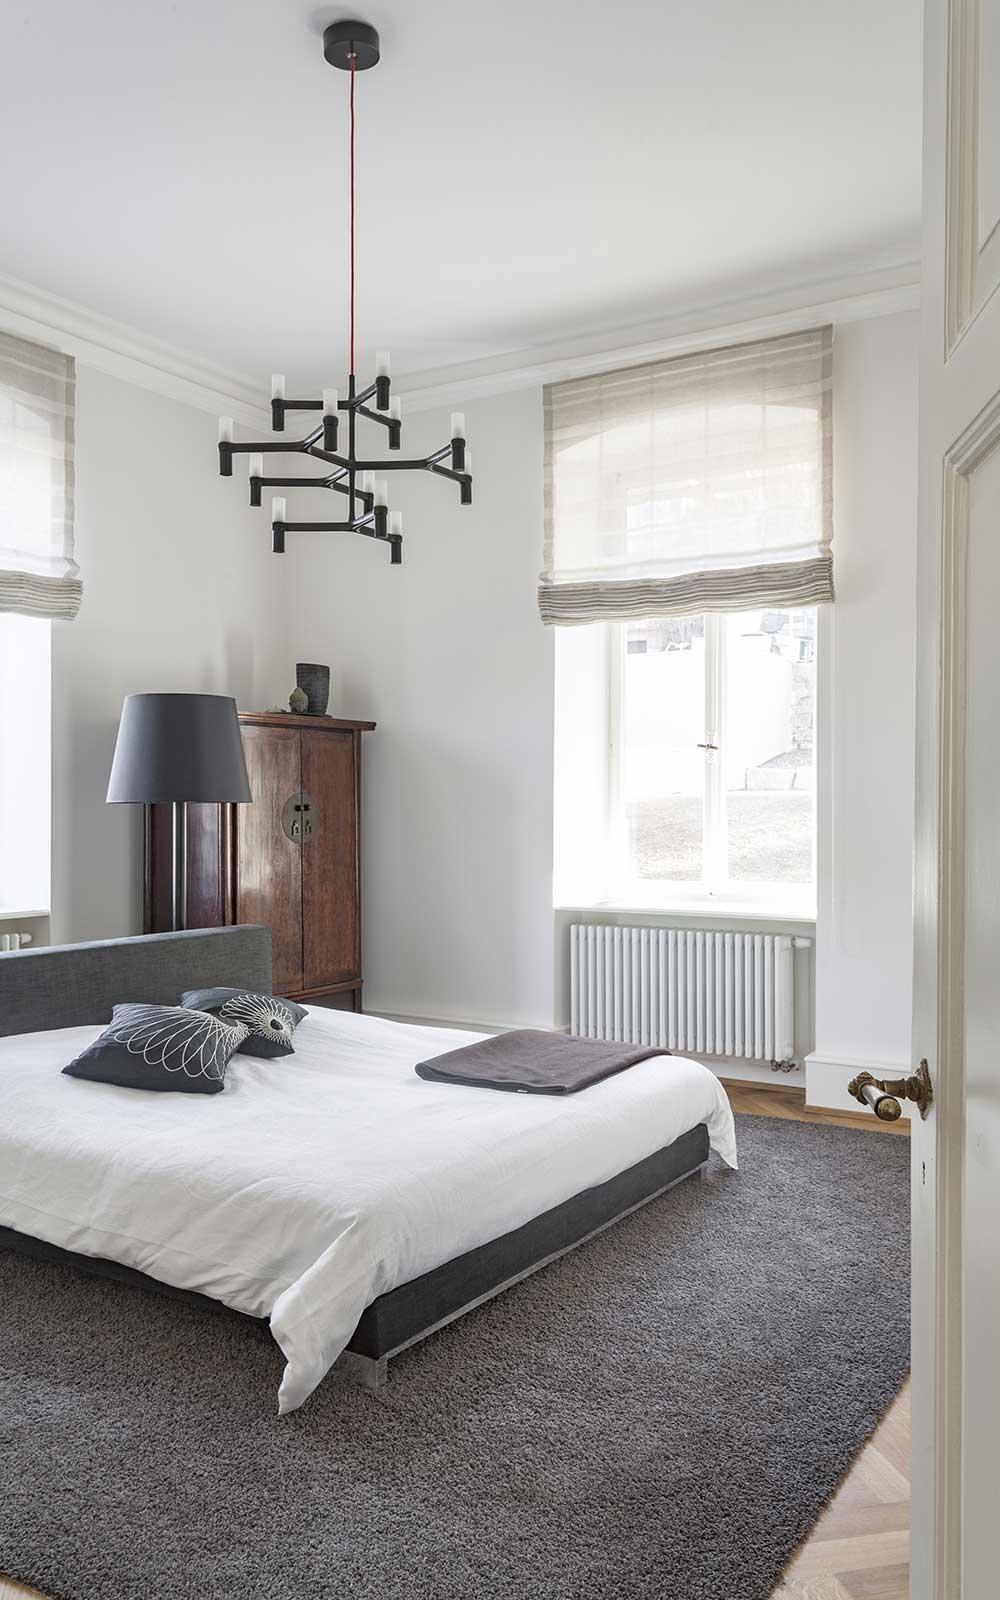 doppelhaush lften kochhan weckbach architekten heidelberg. Black Bedroom Furniture Sets. Home Design Ideas